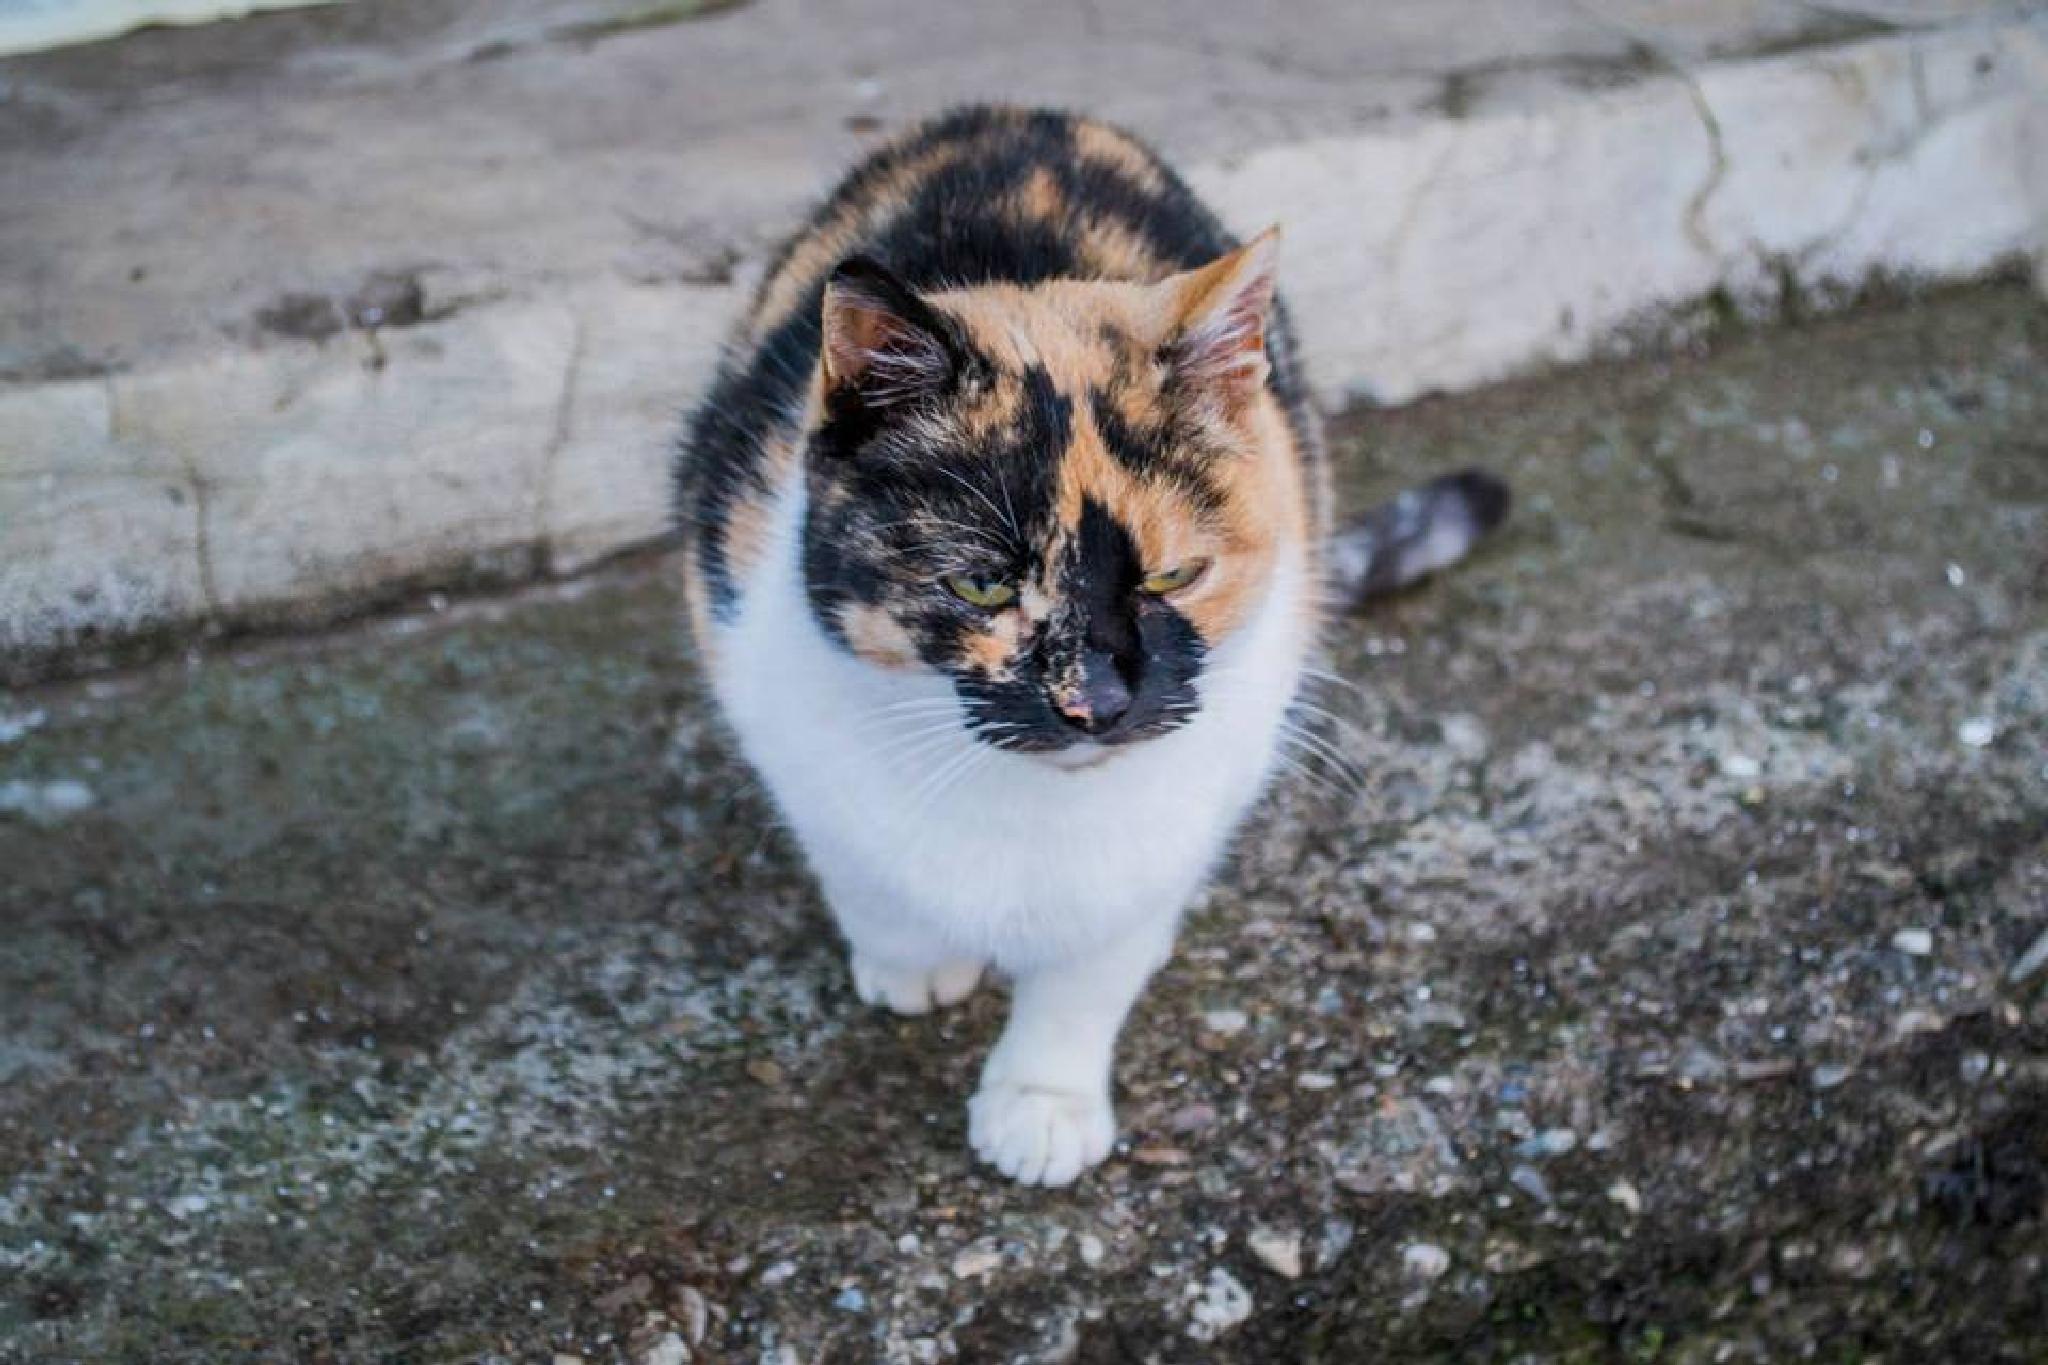 Kitty by Mihai Liviu